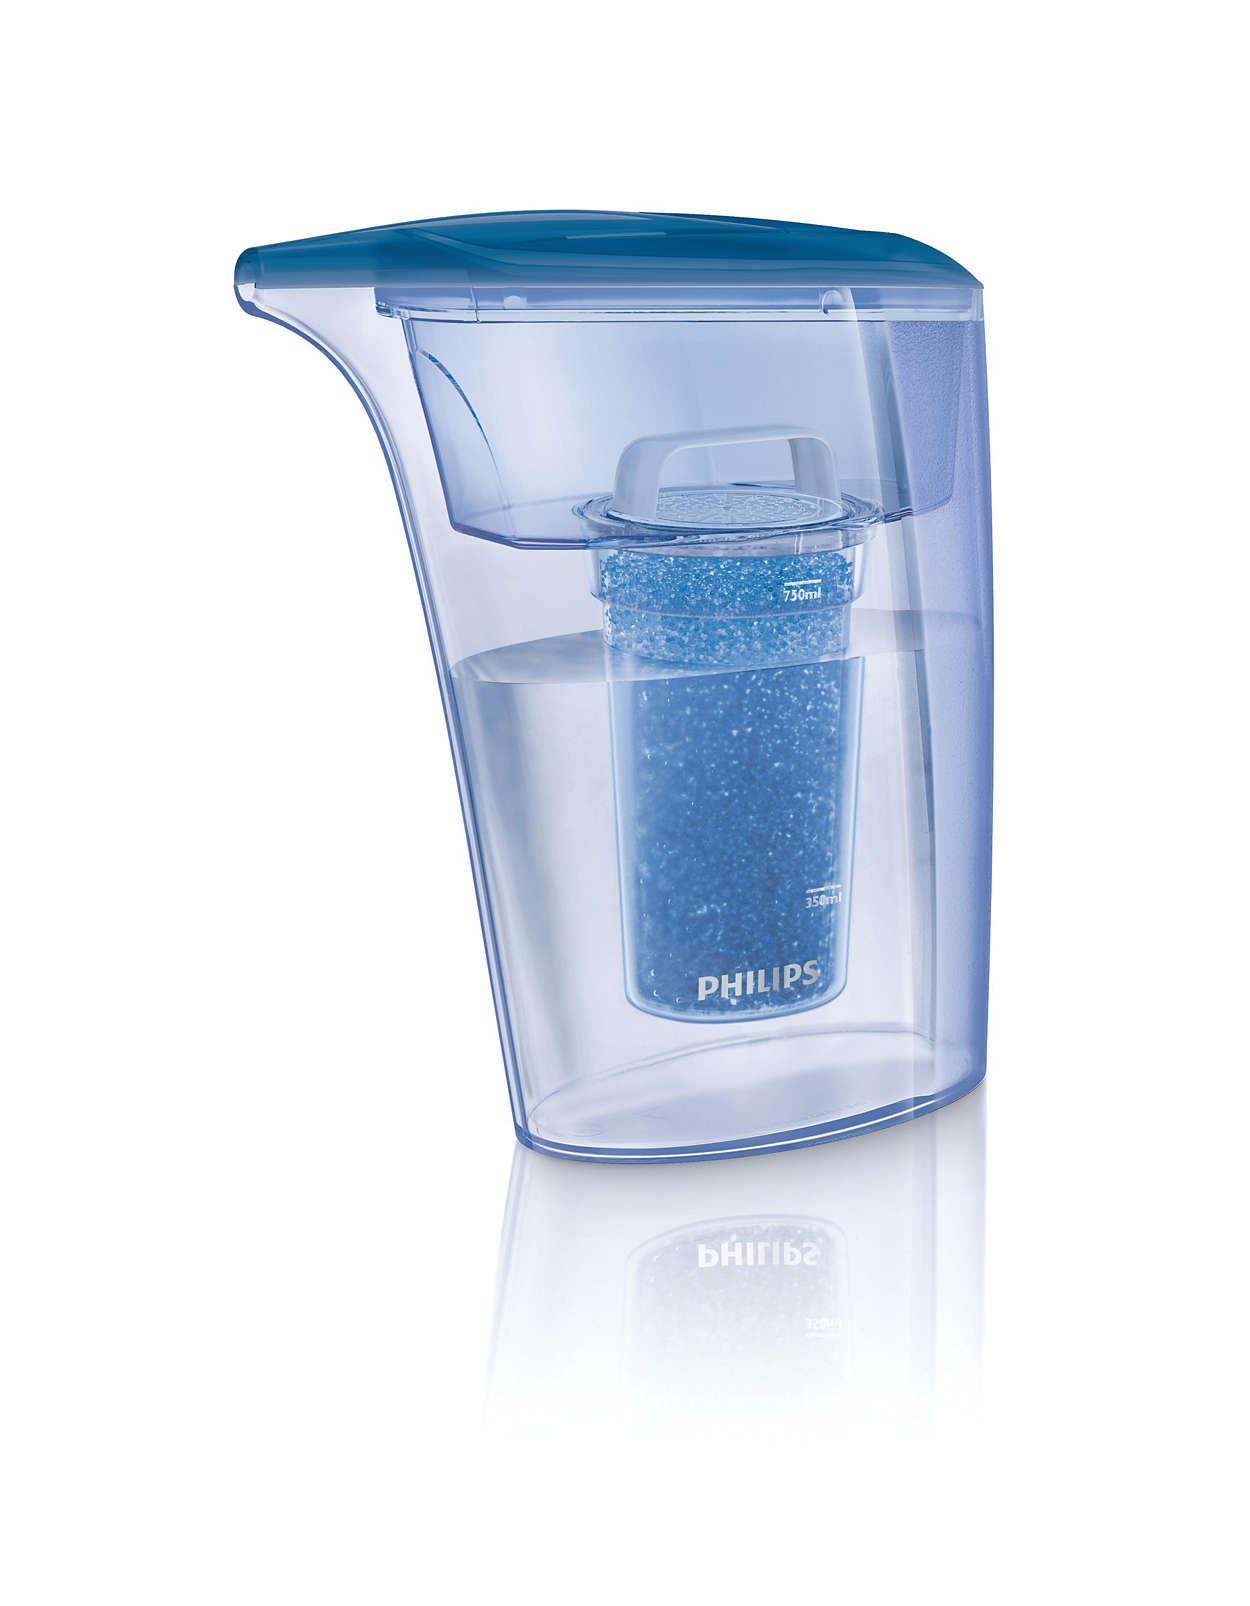 Forhindrer kalk og korrosionsskader